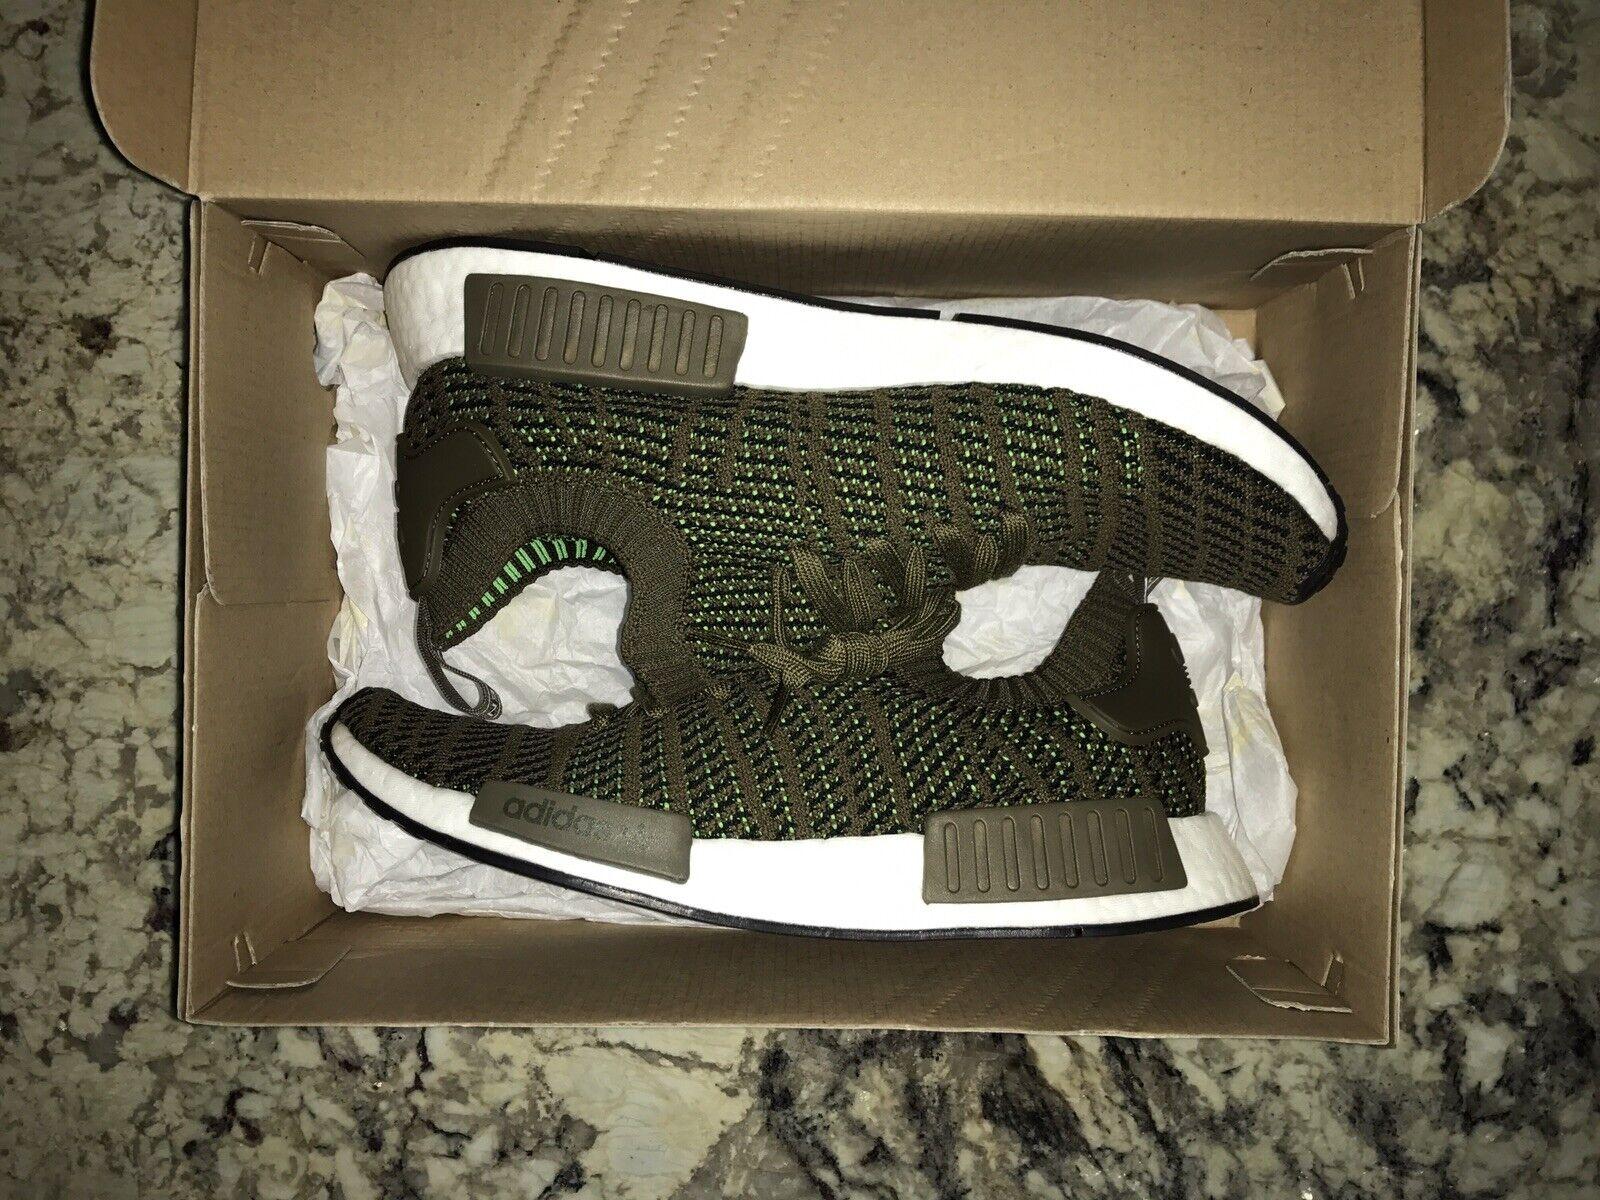 Adidas Originals NMD R1 Stlt Pk Primeknit Olive Green White Men (CQ2389) size 10